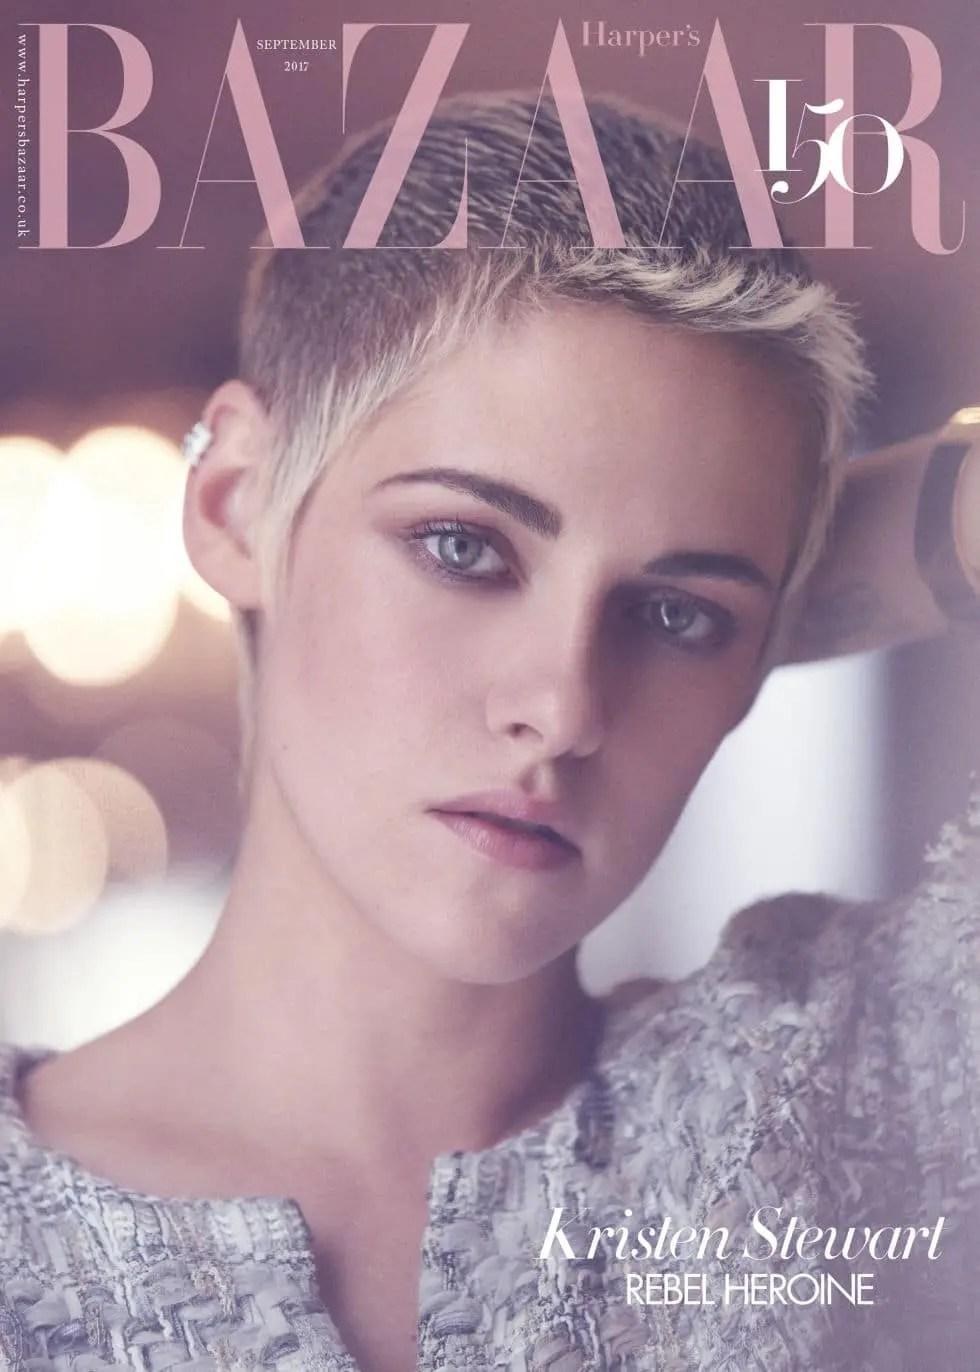 Kristen Stewart portada Bazaar